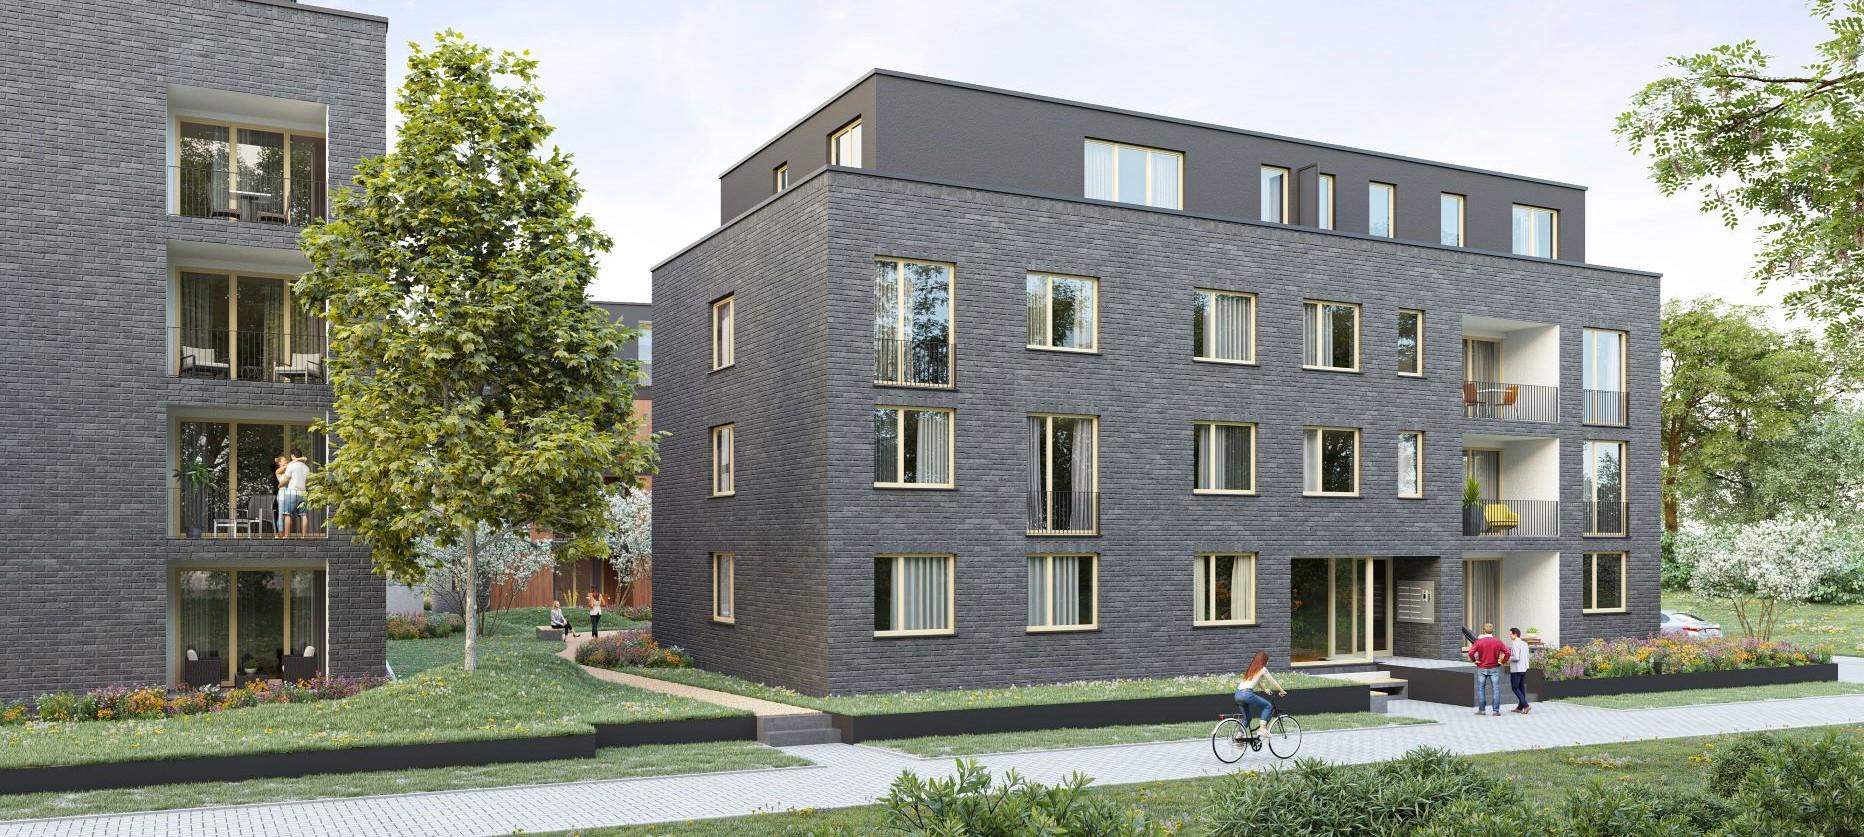 Immobilien Rheinstetten Teaser